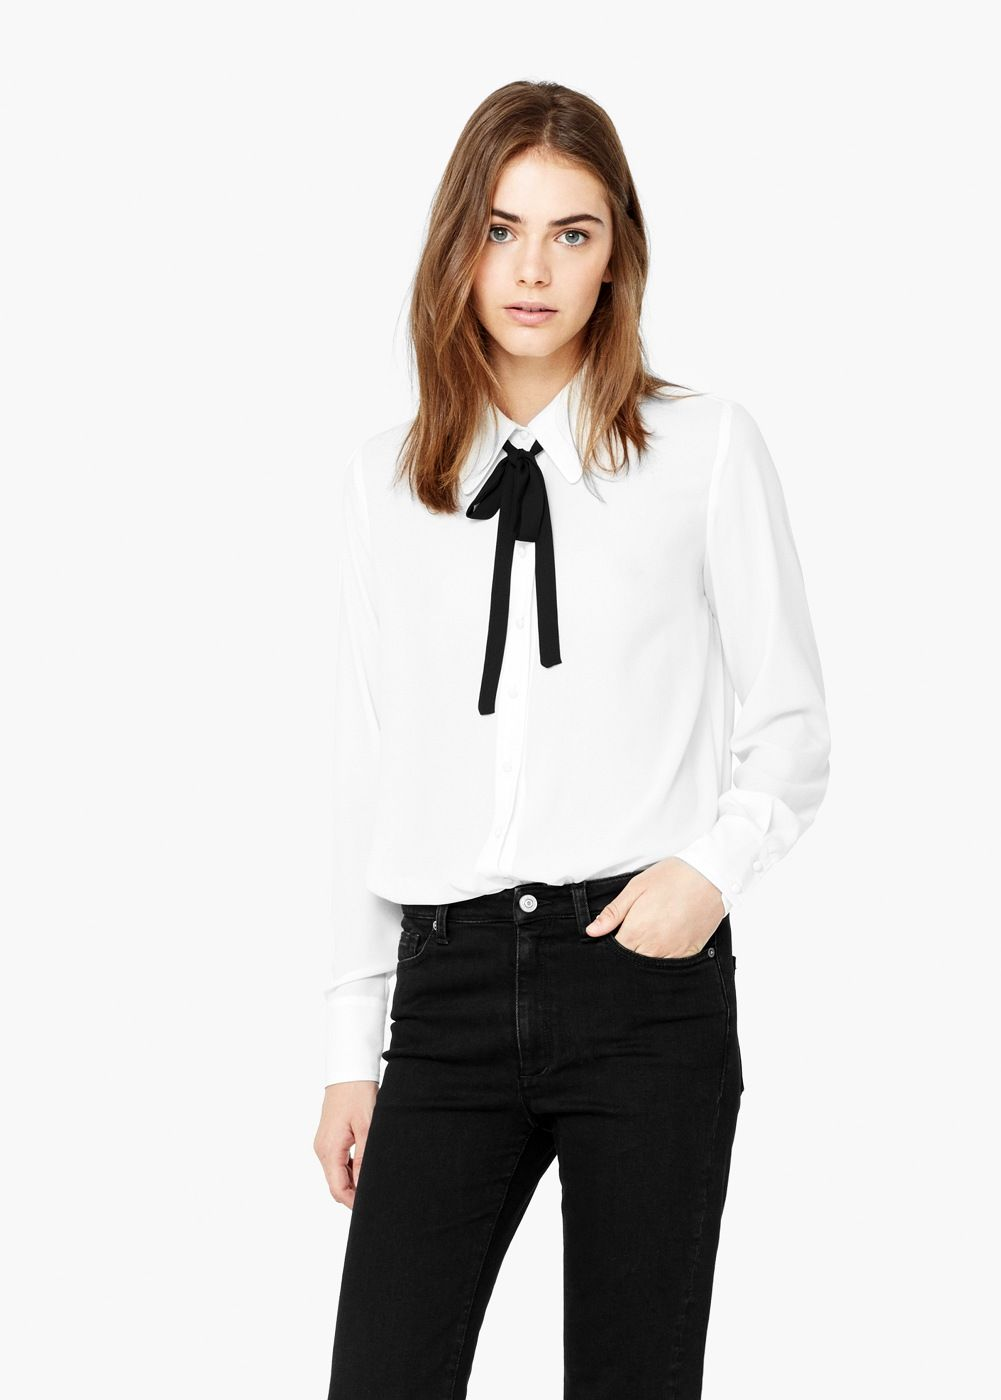 aef0bd7f6a Blusa lazo cuello - Mujer | Latin Fashion | Blusas con lazo, Camisas ...